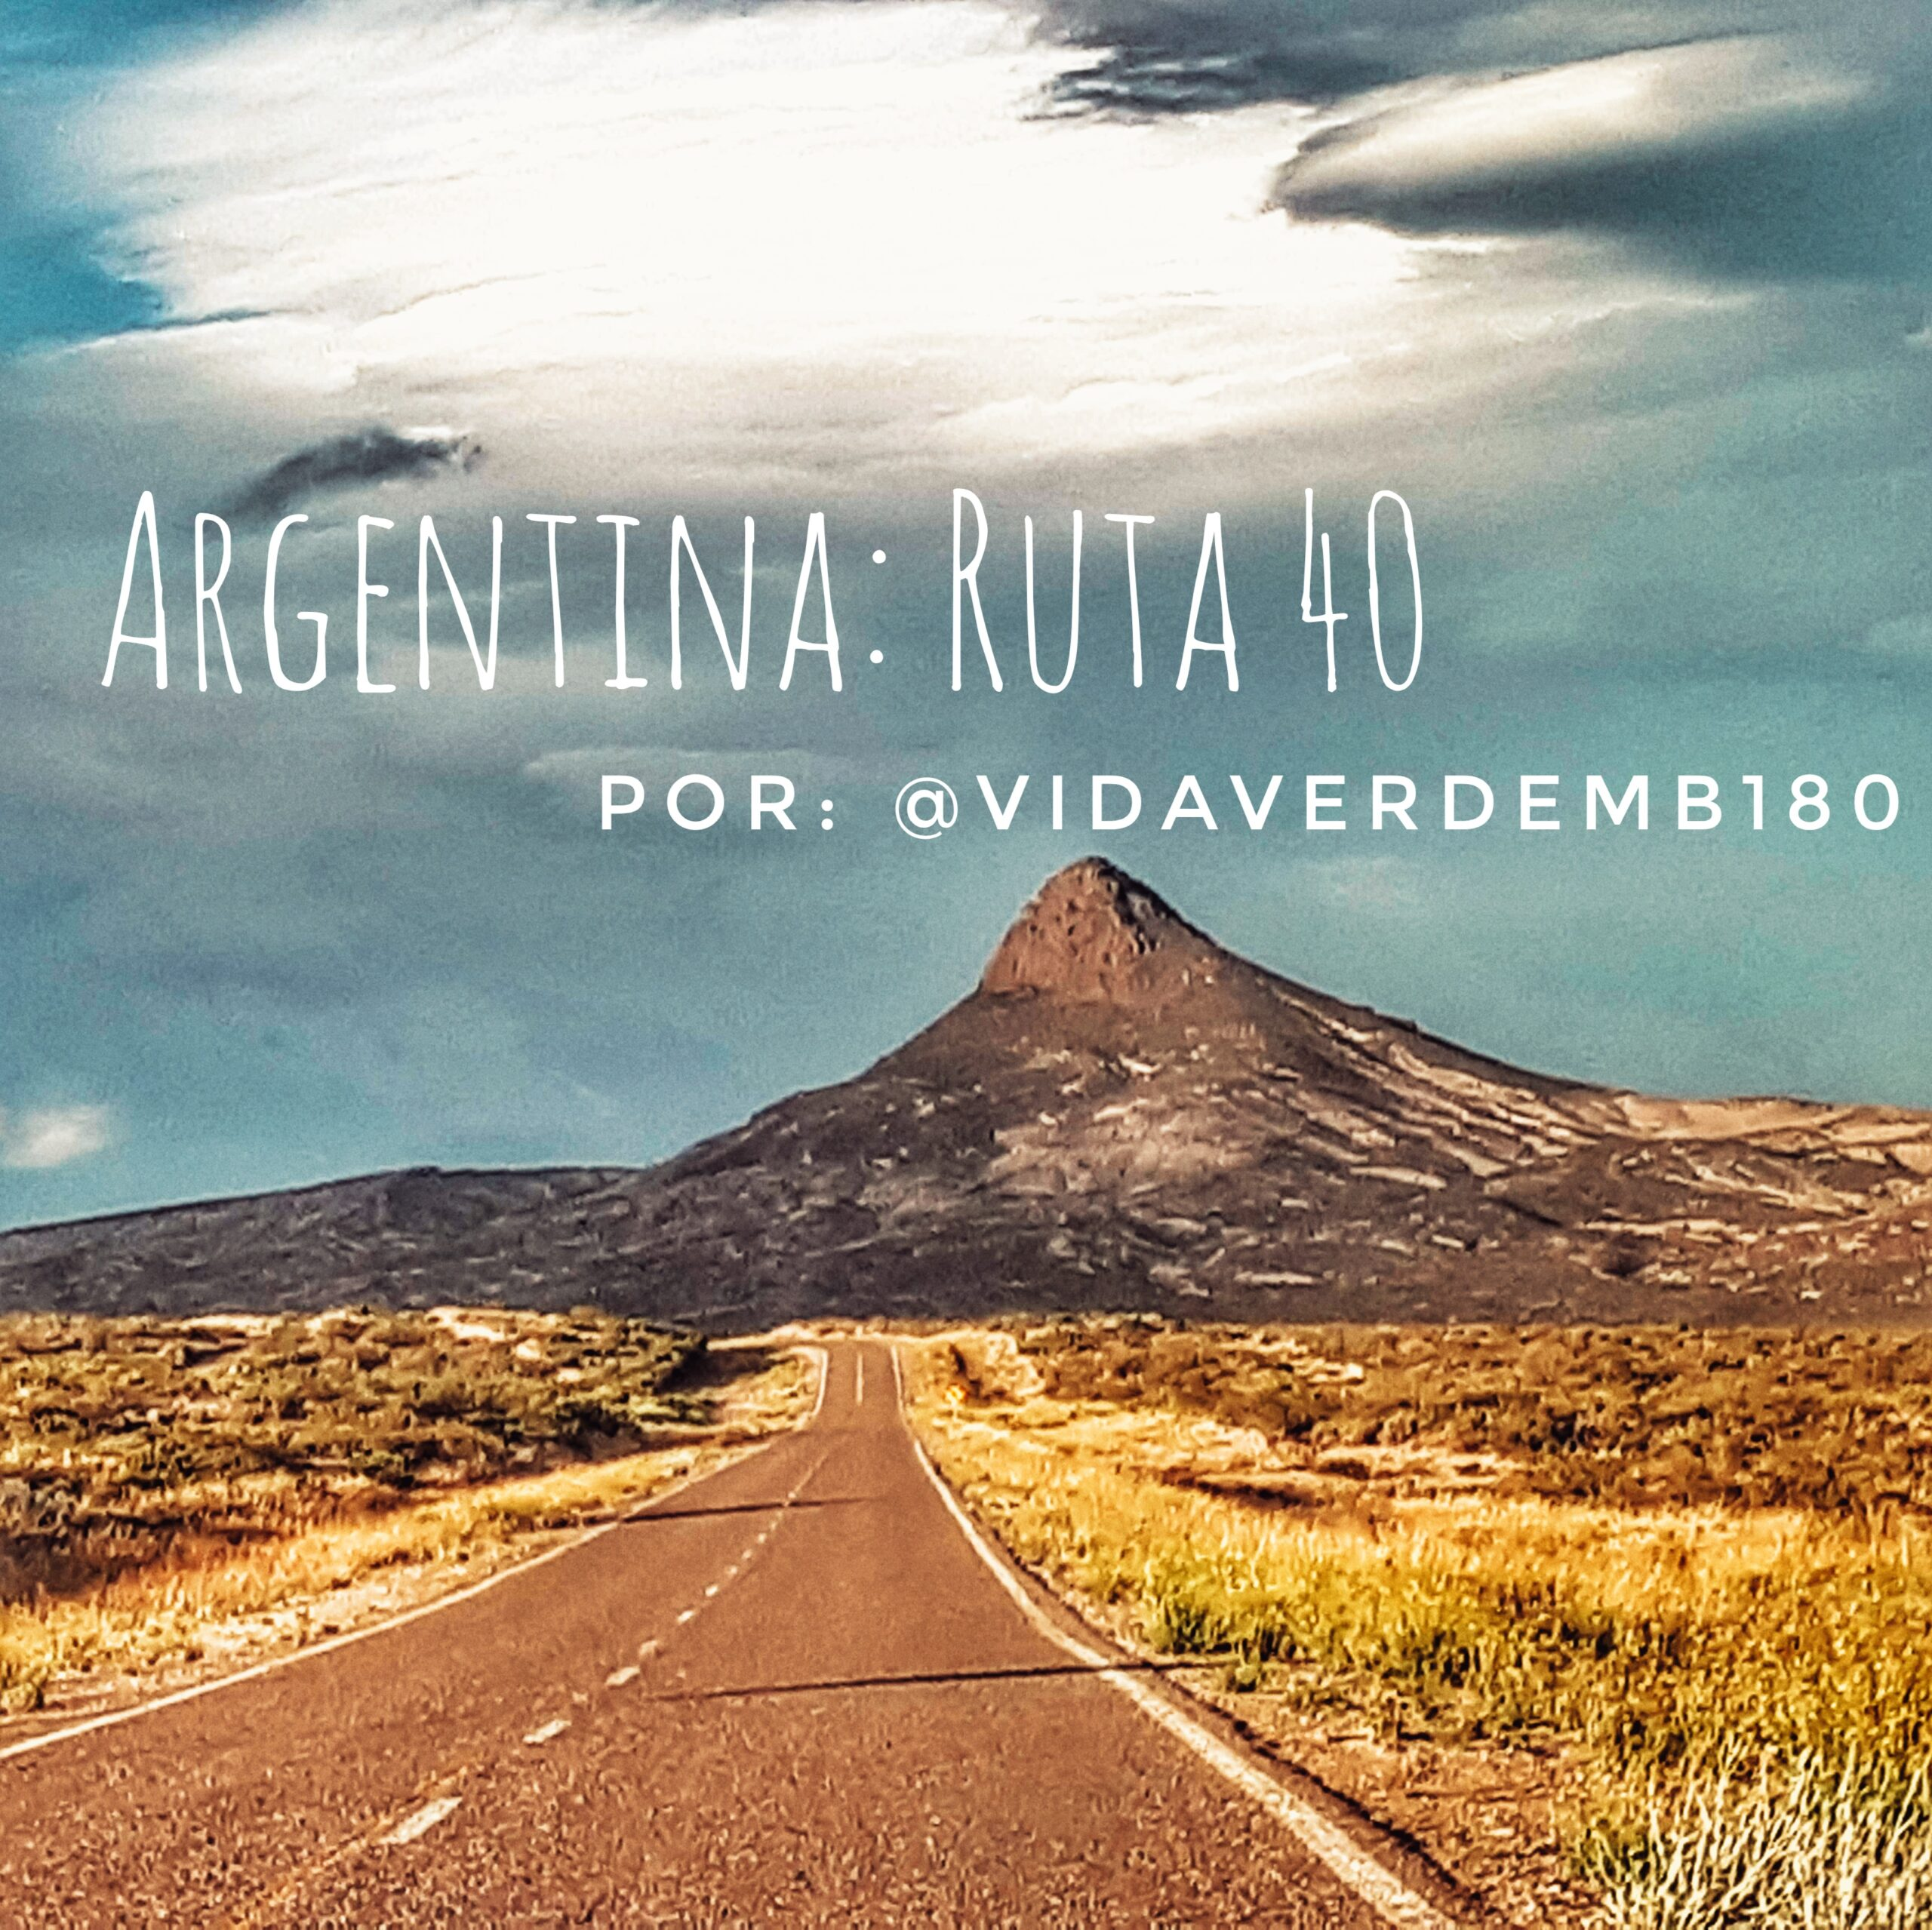 Argentina de abajo a arriba: ruta 40 por @vidaverdemb180